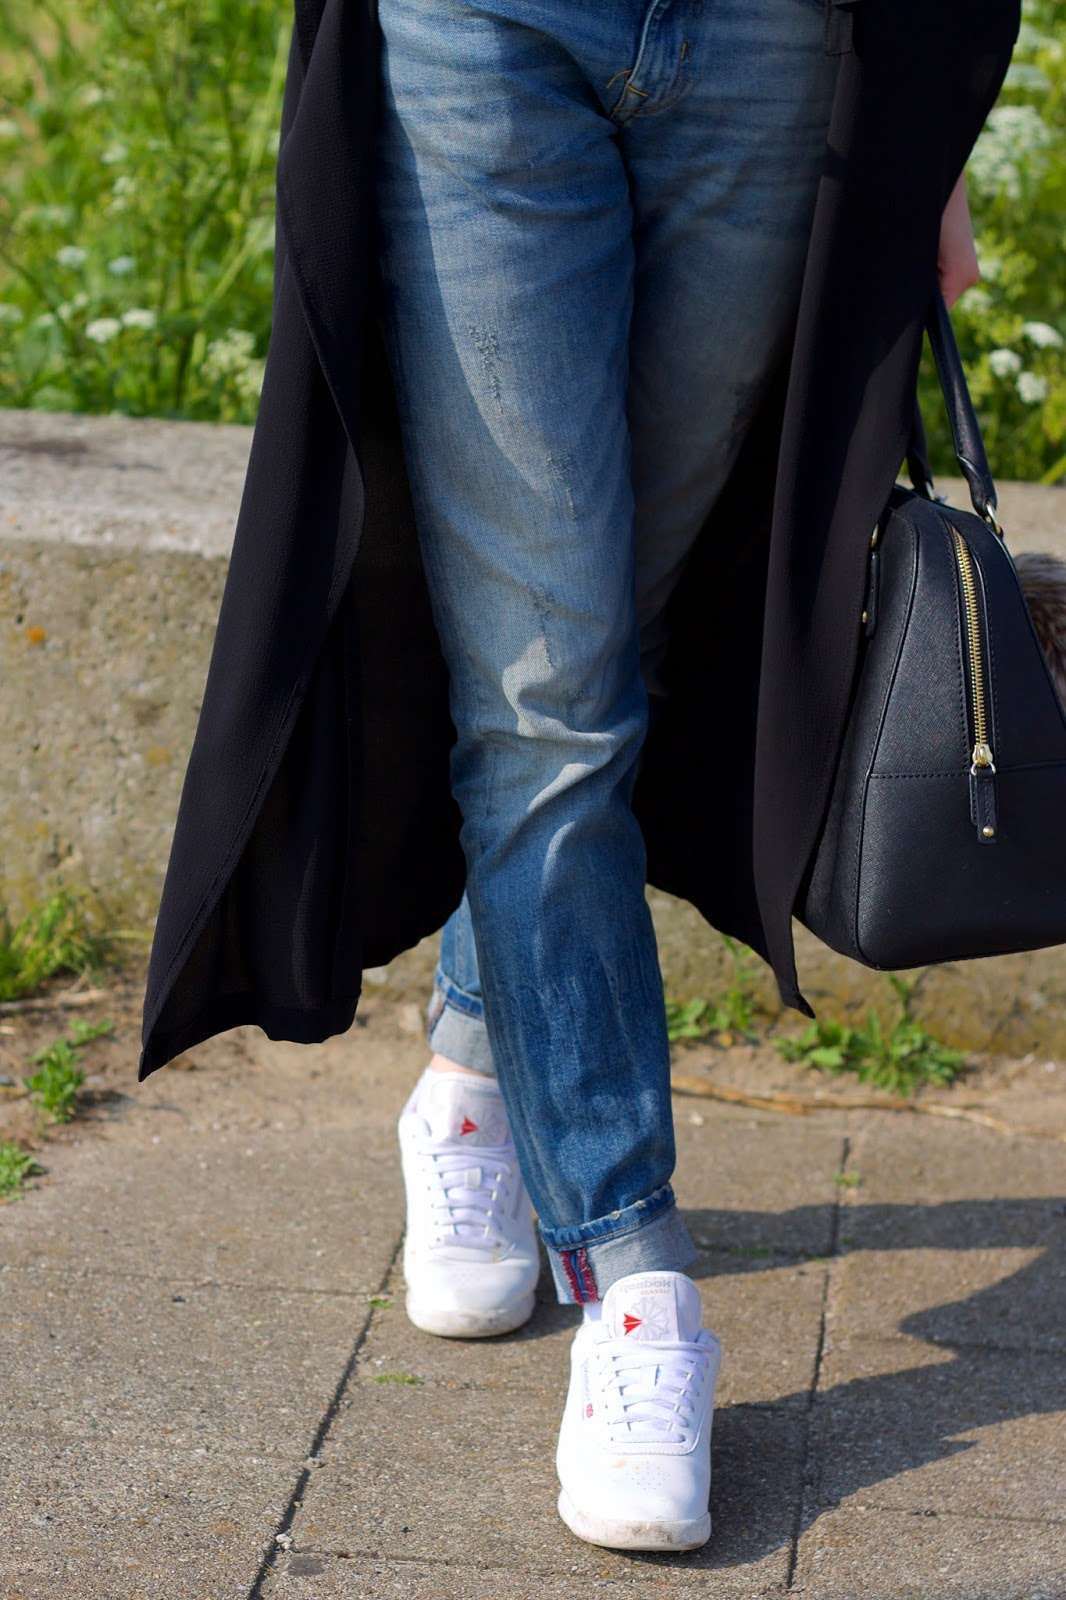 Sneakers x Long Jacket